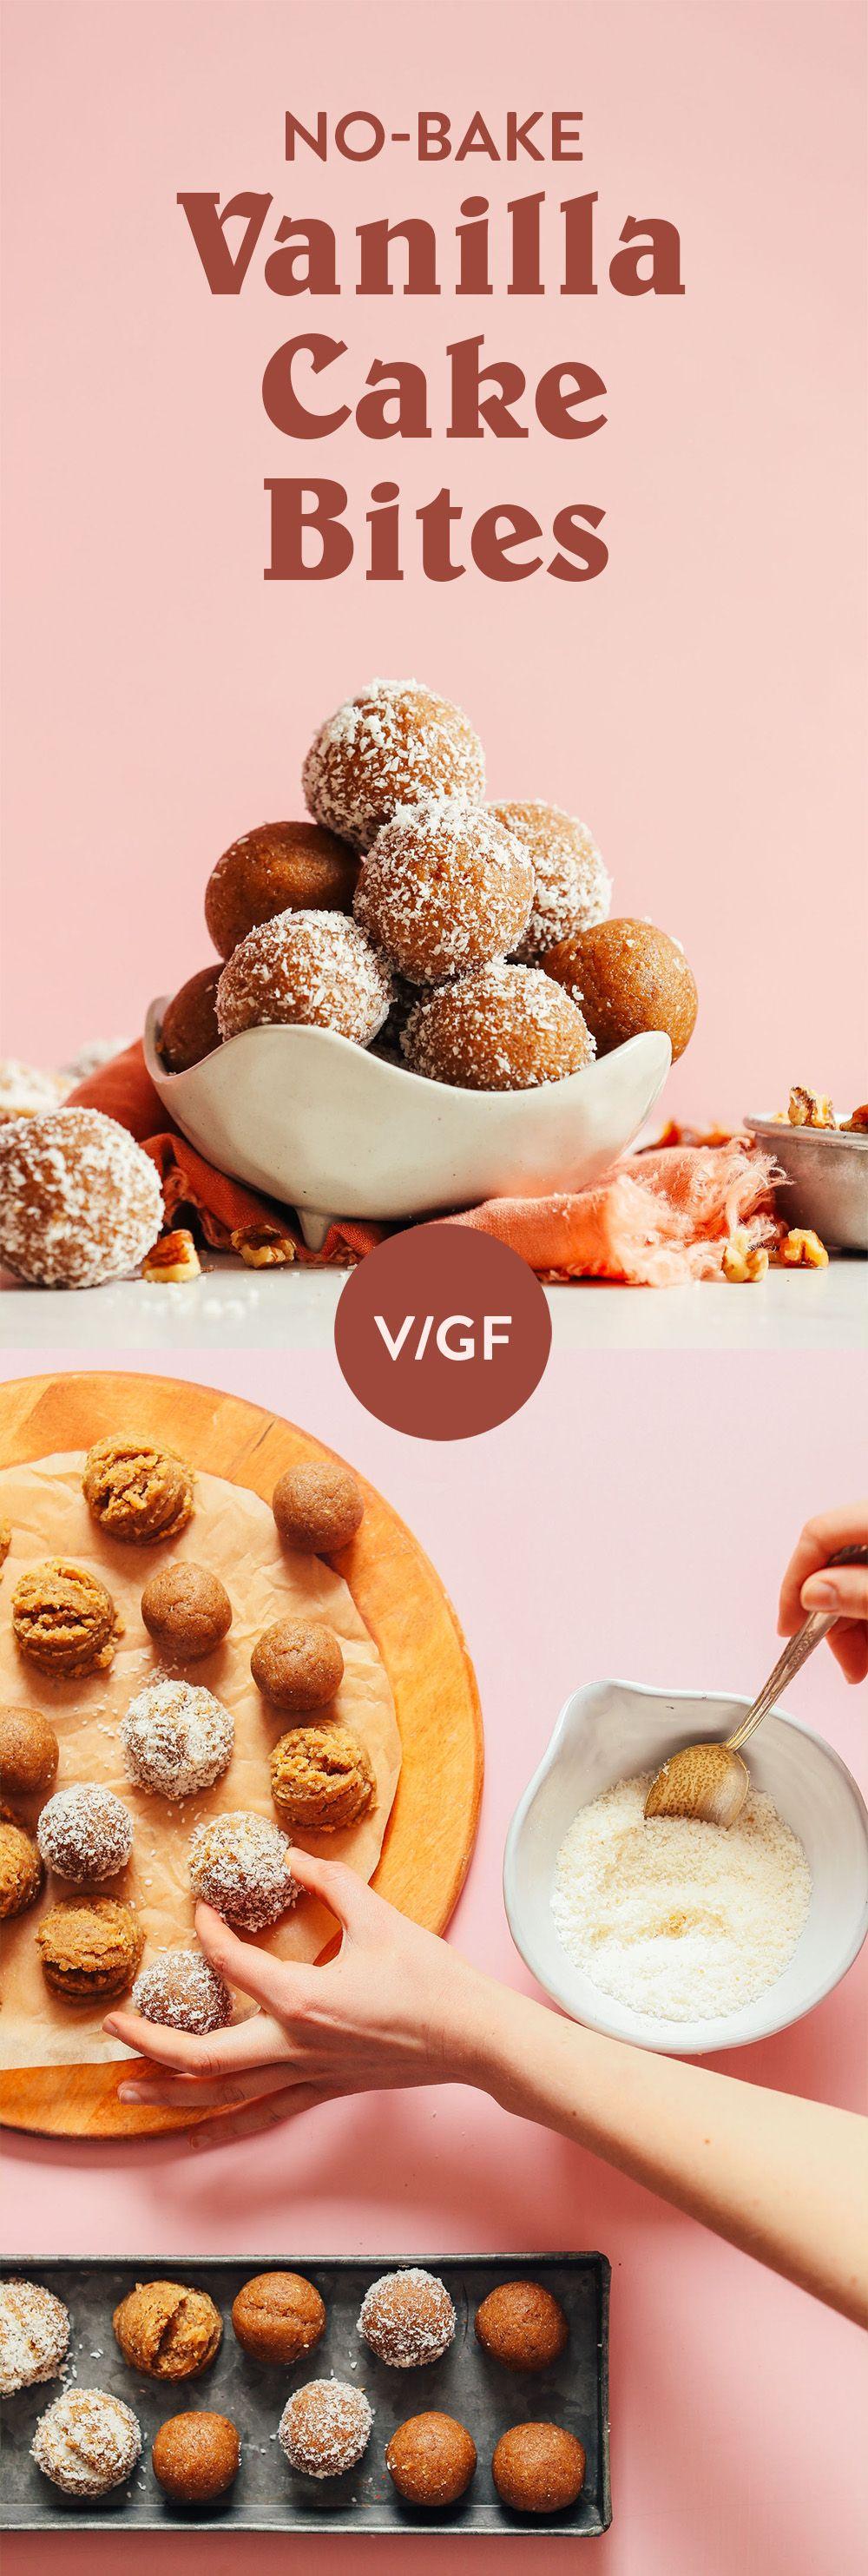 No Bake Vanilla Cake Bites Minimalist Baker Recipes Recipe Cake Bites Vegan Desserts Baker Recipes